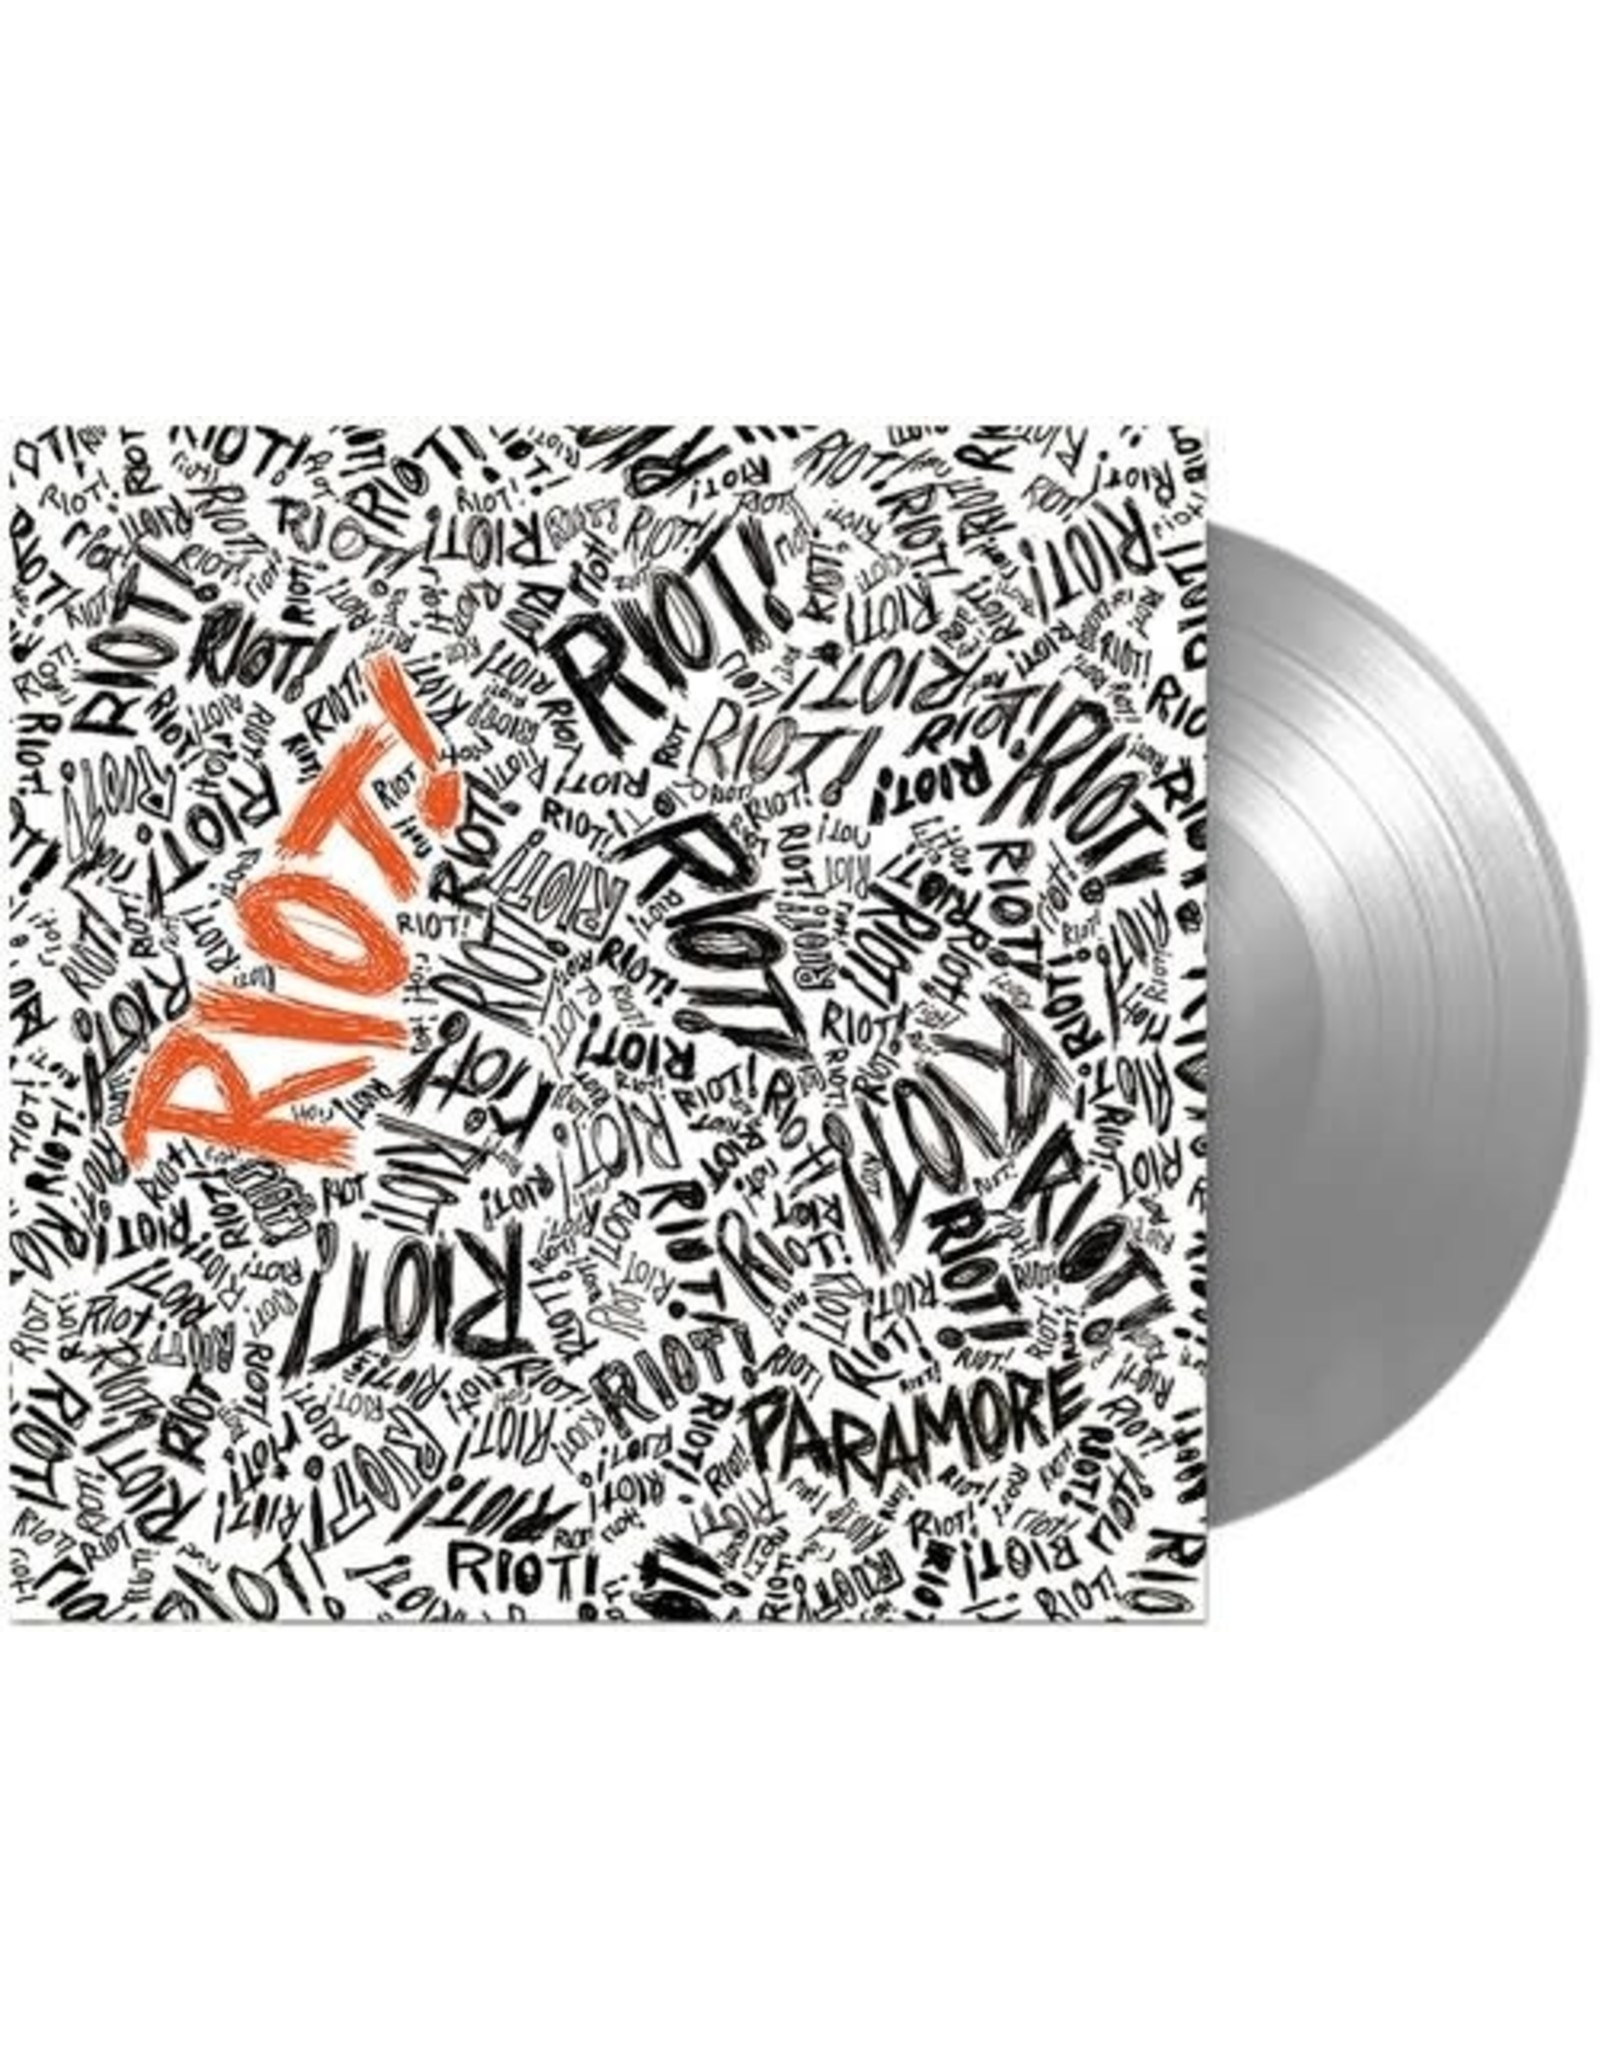 Paramore - Riot! LP (FBR 25th Anniversary Silver Viny)